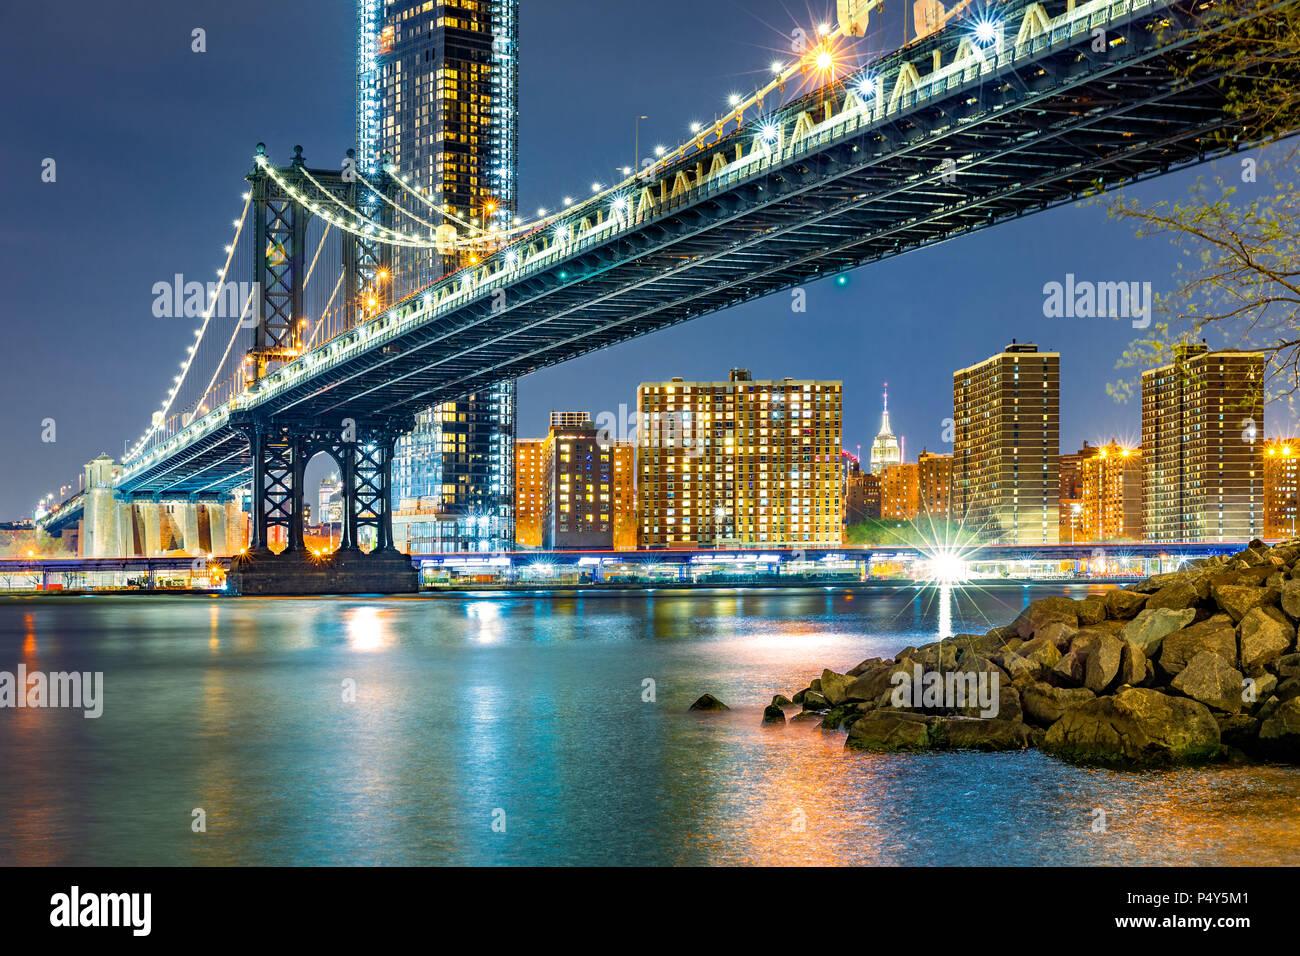 Pont de Manhattan by night Photo Stock